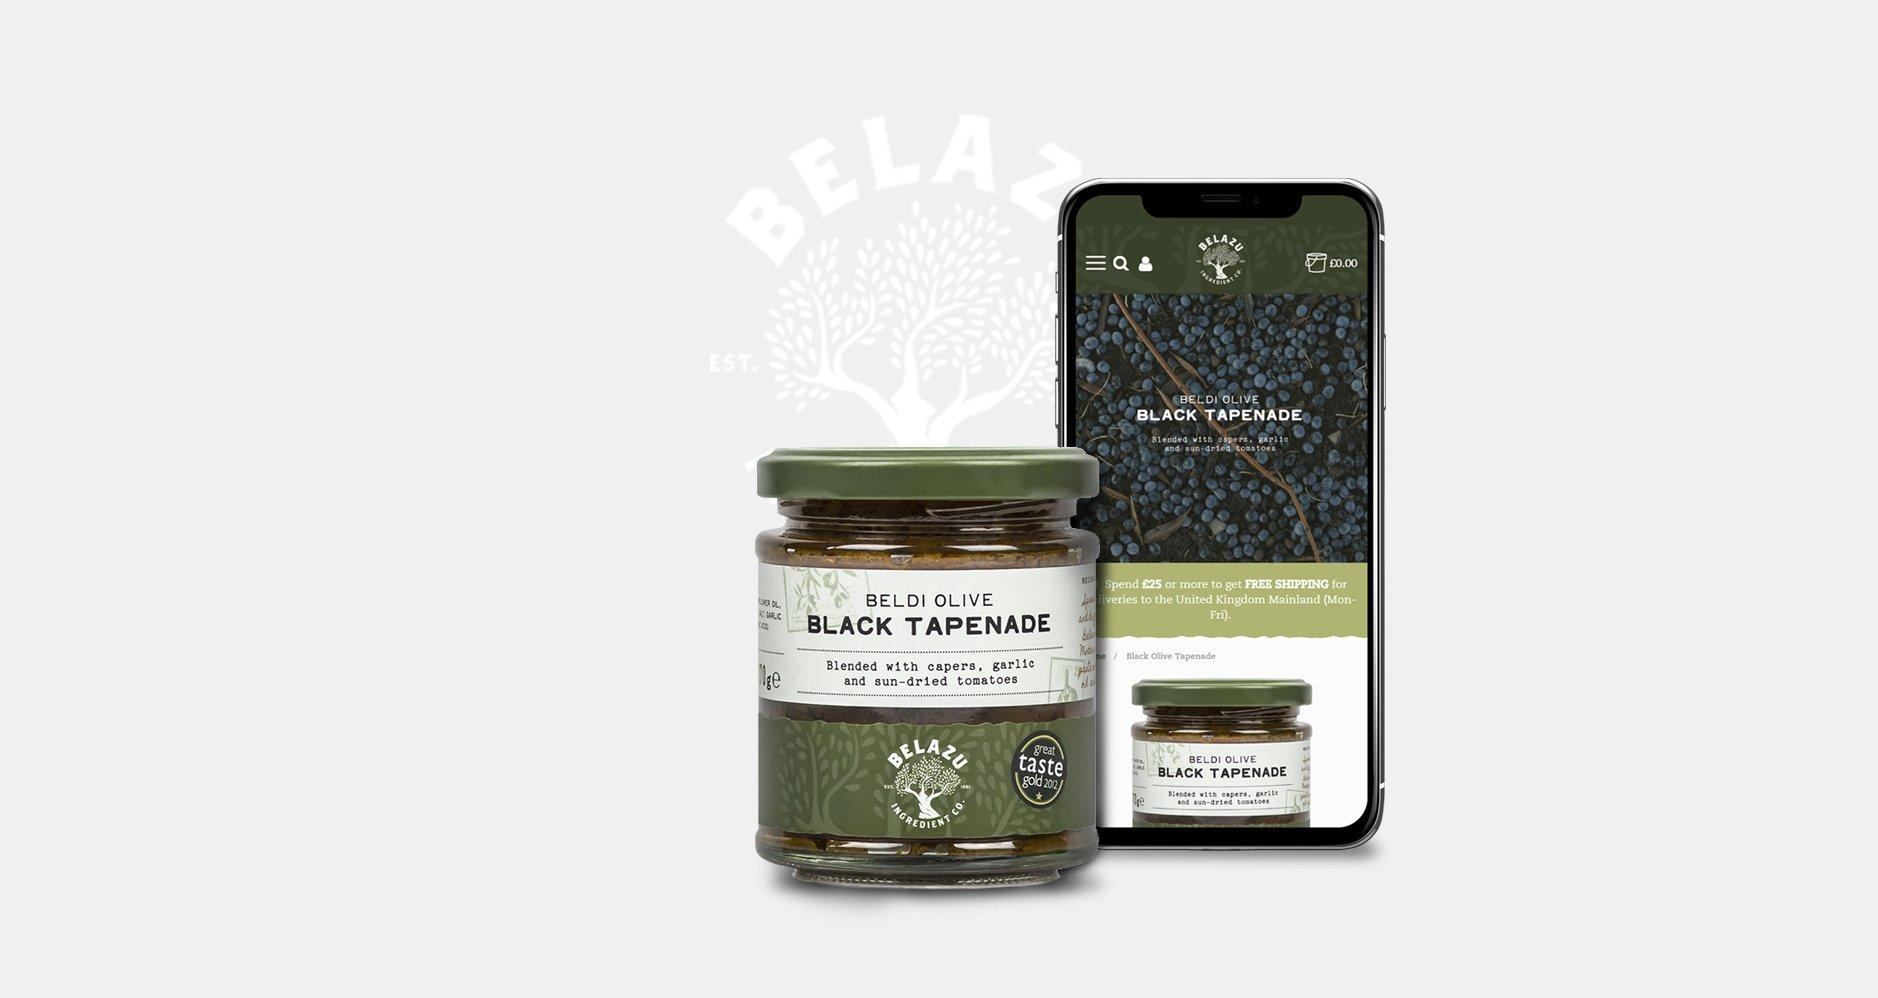 Belazu Responsive design and Jar